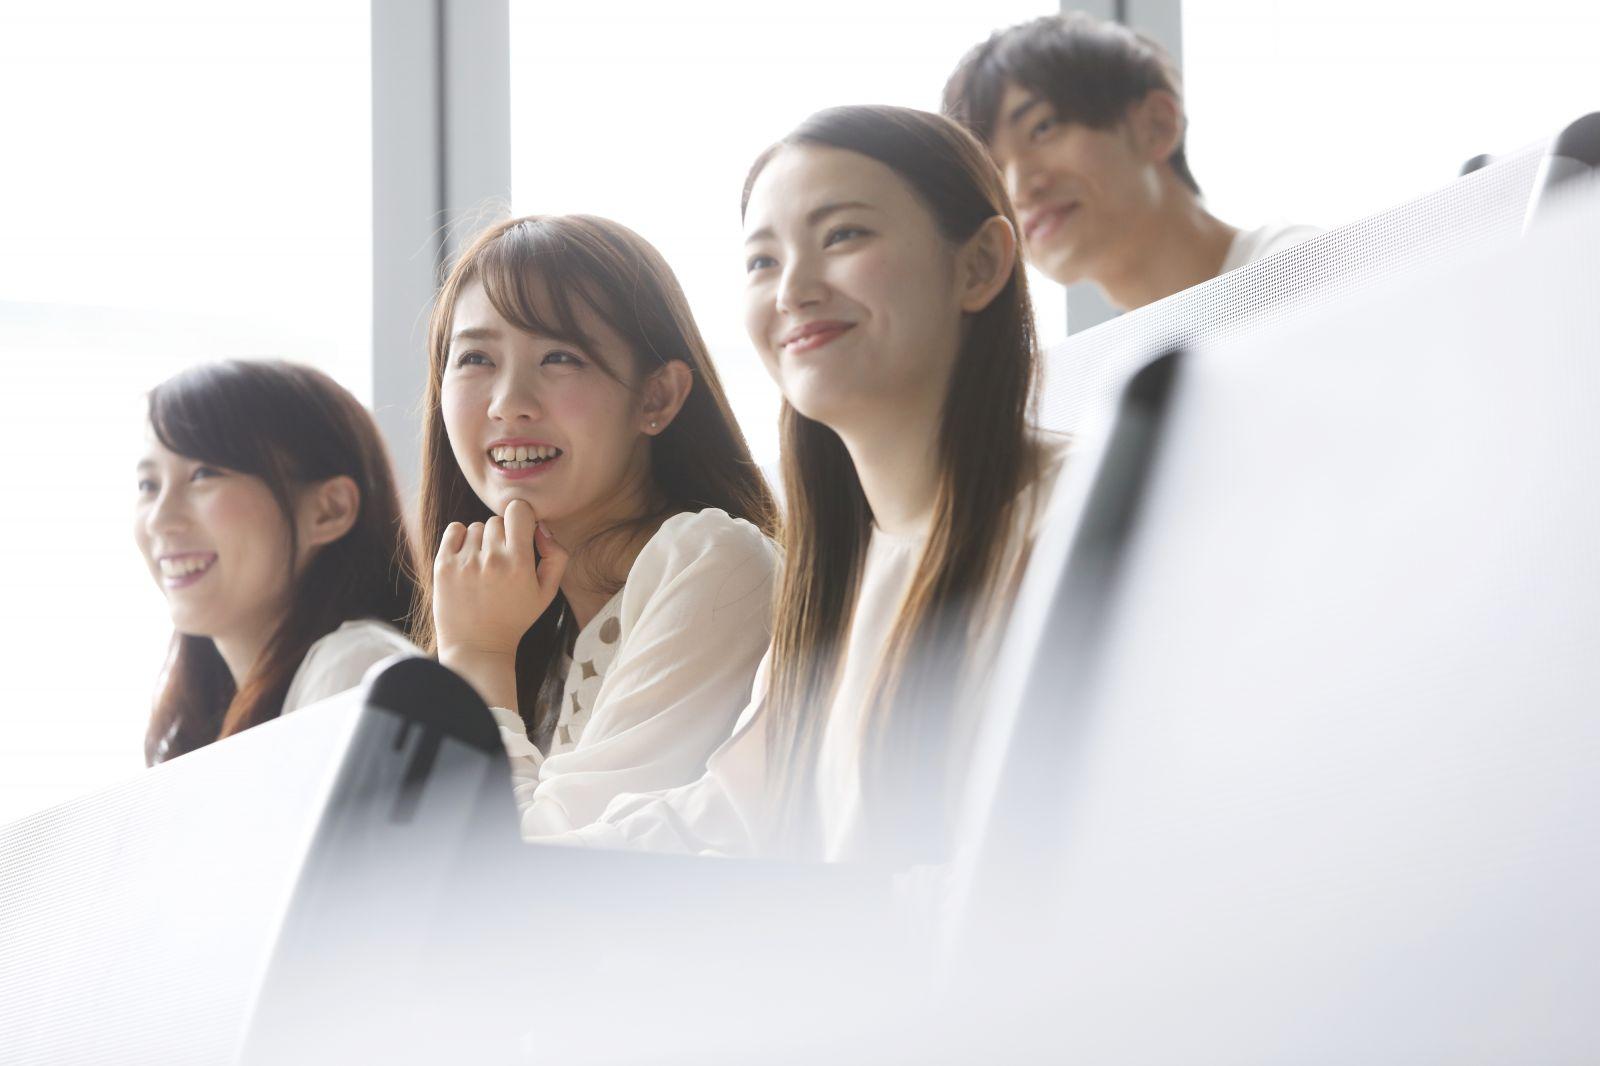 【NEW6月21日13時開催】横浜キャンパス WORKSHOP 美容メソッド 「小顔と足痩せ」